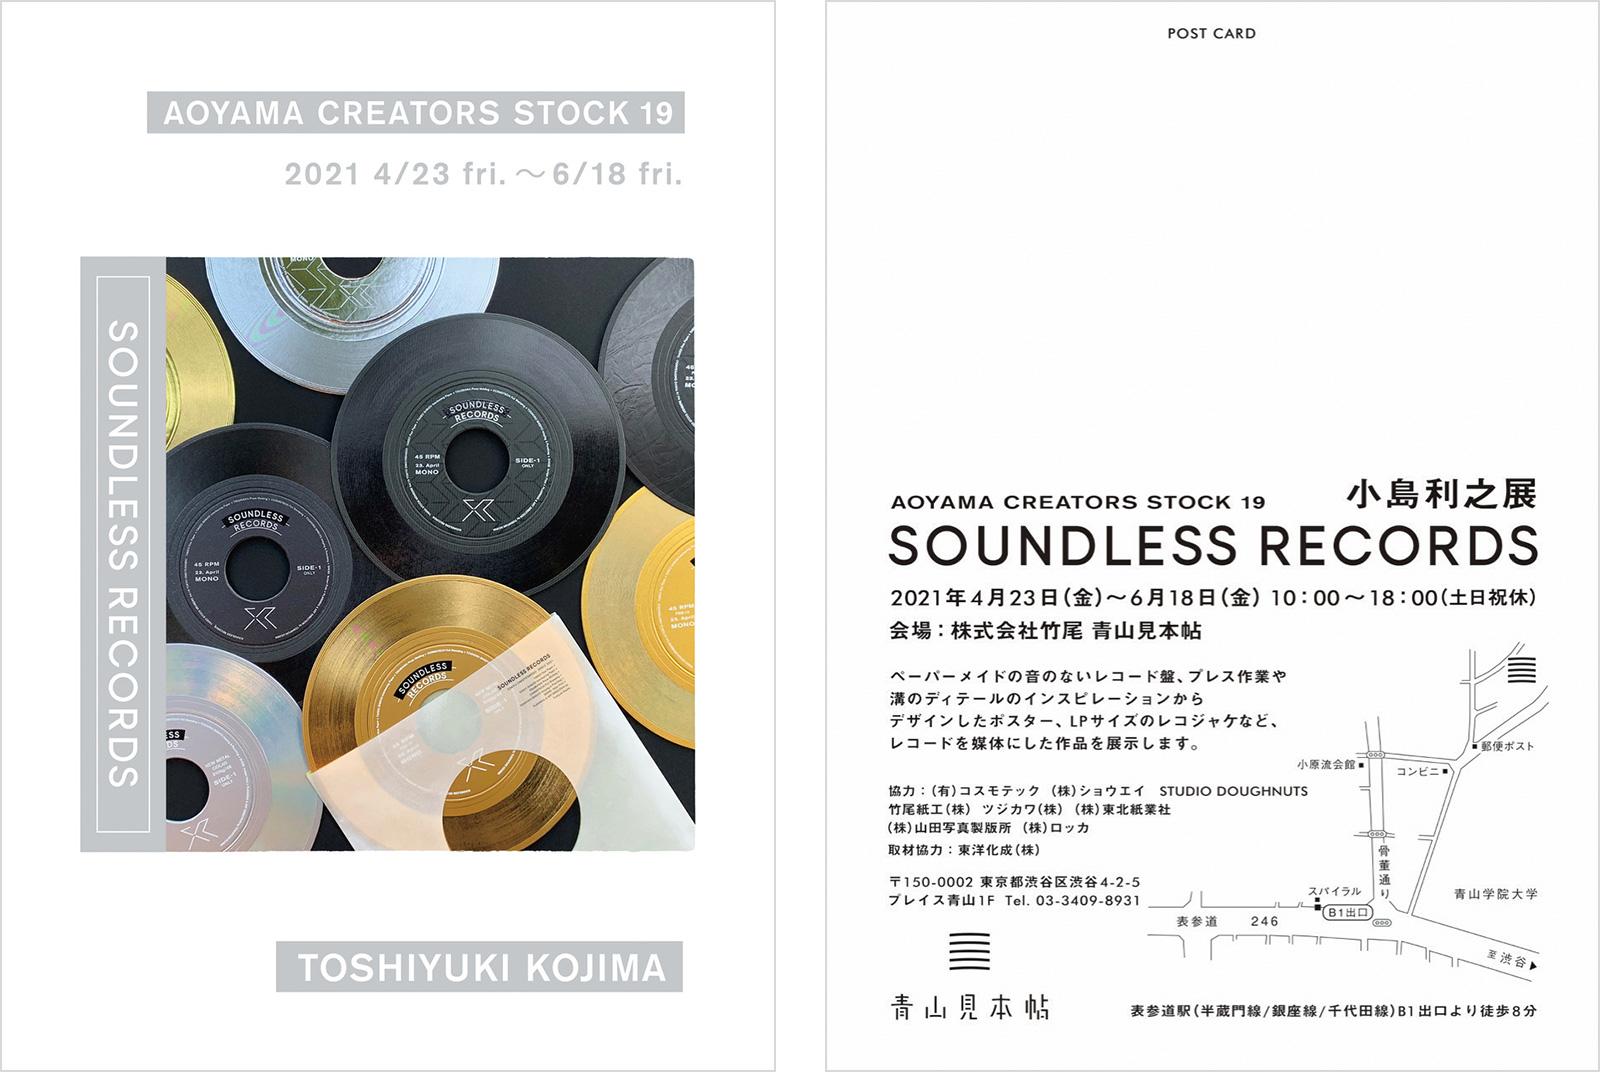 AOYAMA CREATORS STOCK 19 小島利之展 SOUNDLESS RECORDS